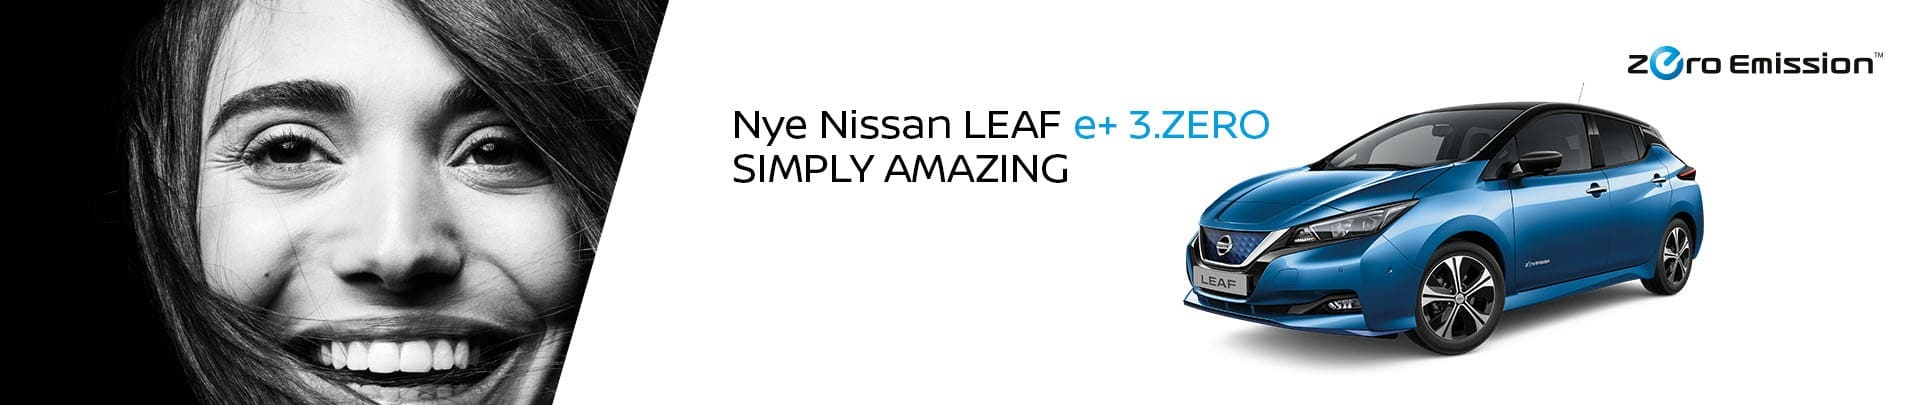 Toppbanner Nissan Leaf e+ 3.ZERO